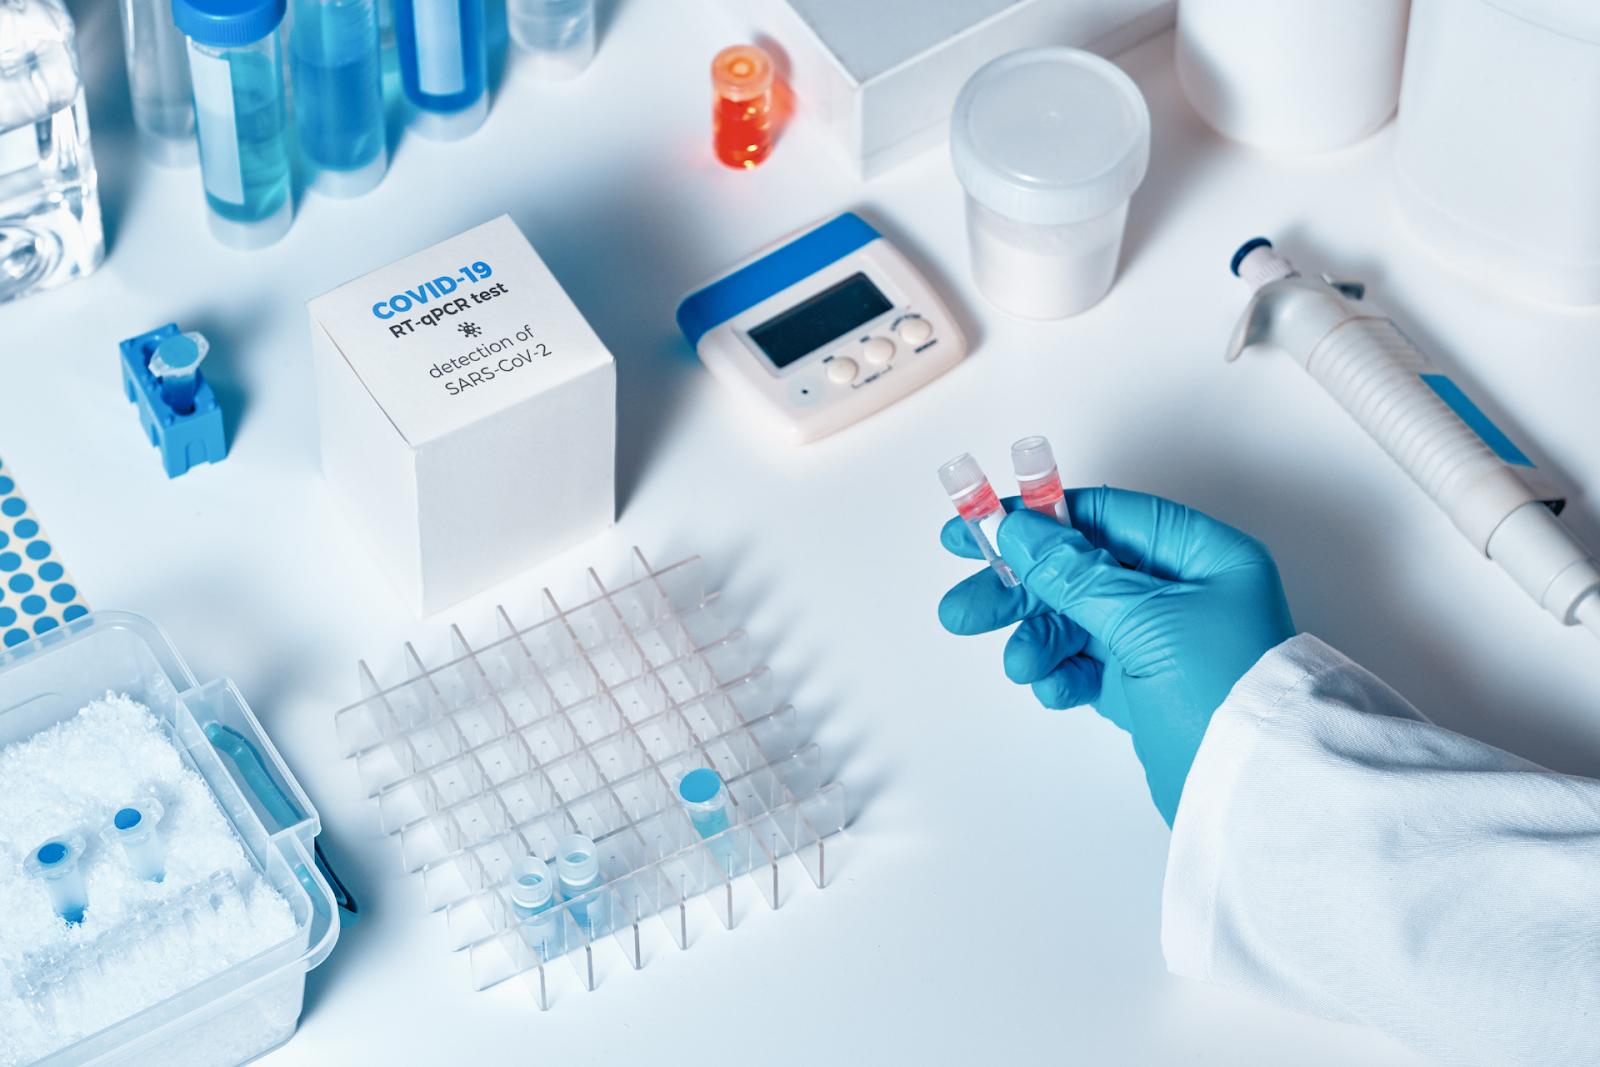 Quick Novel COVID-19 Coronavirus Test Kit